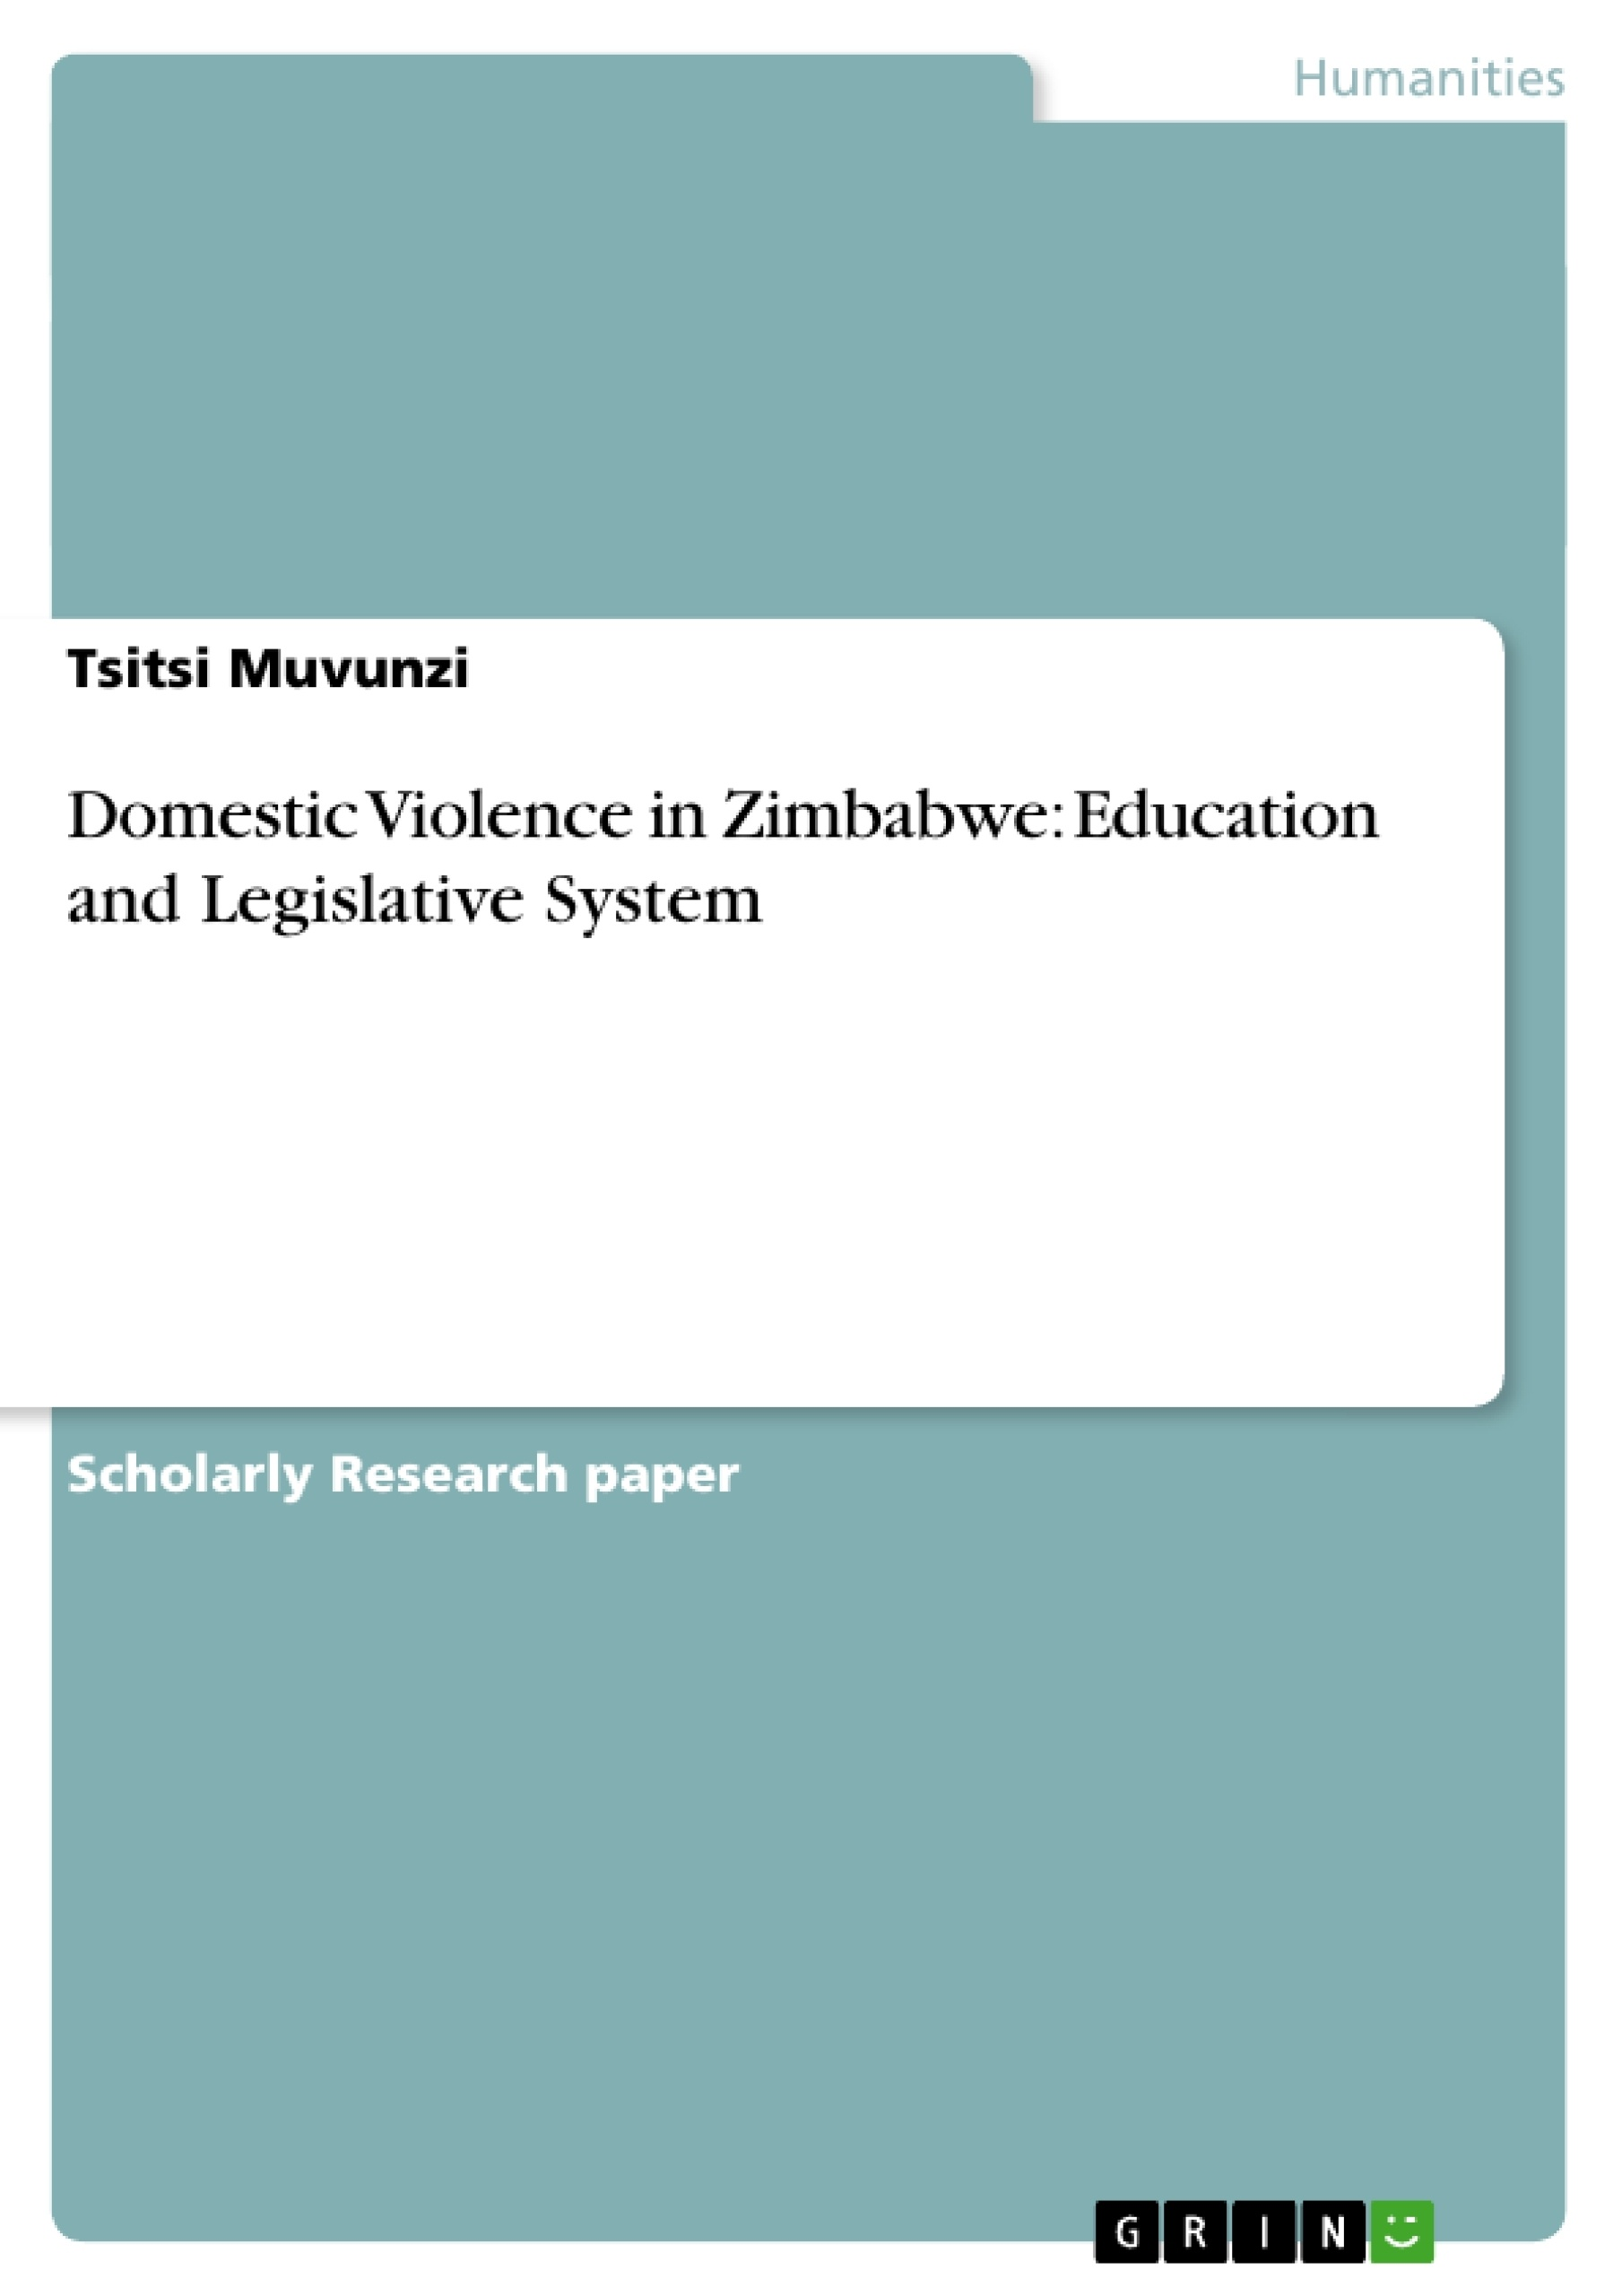 Title: Domestic Violence in Zimbabwe: Education and Legislative System